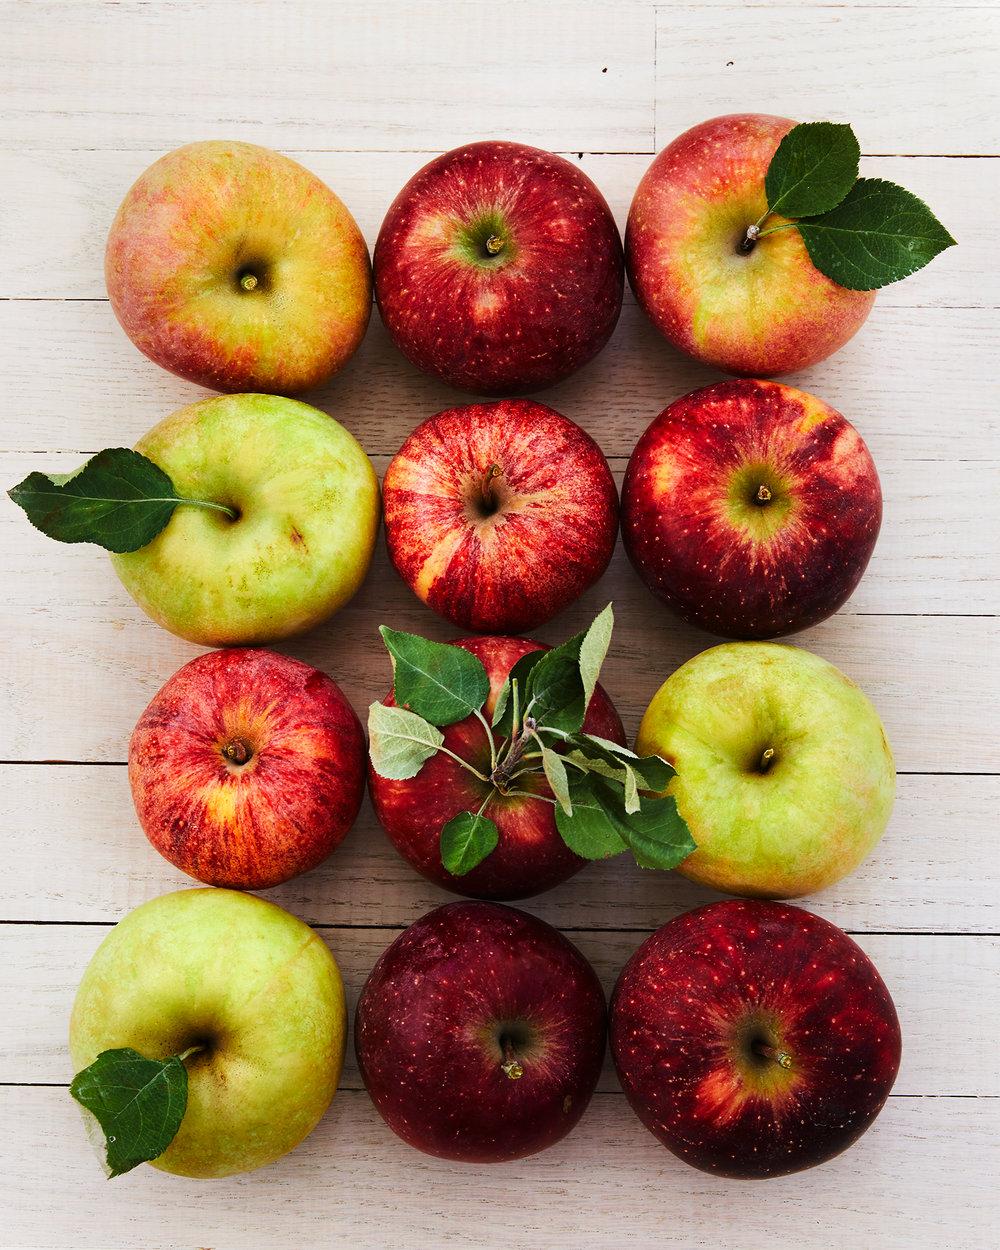 Apples1930.jpg